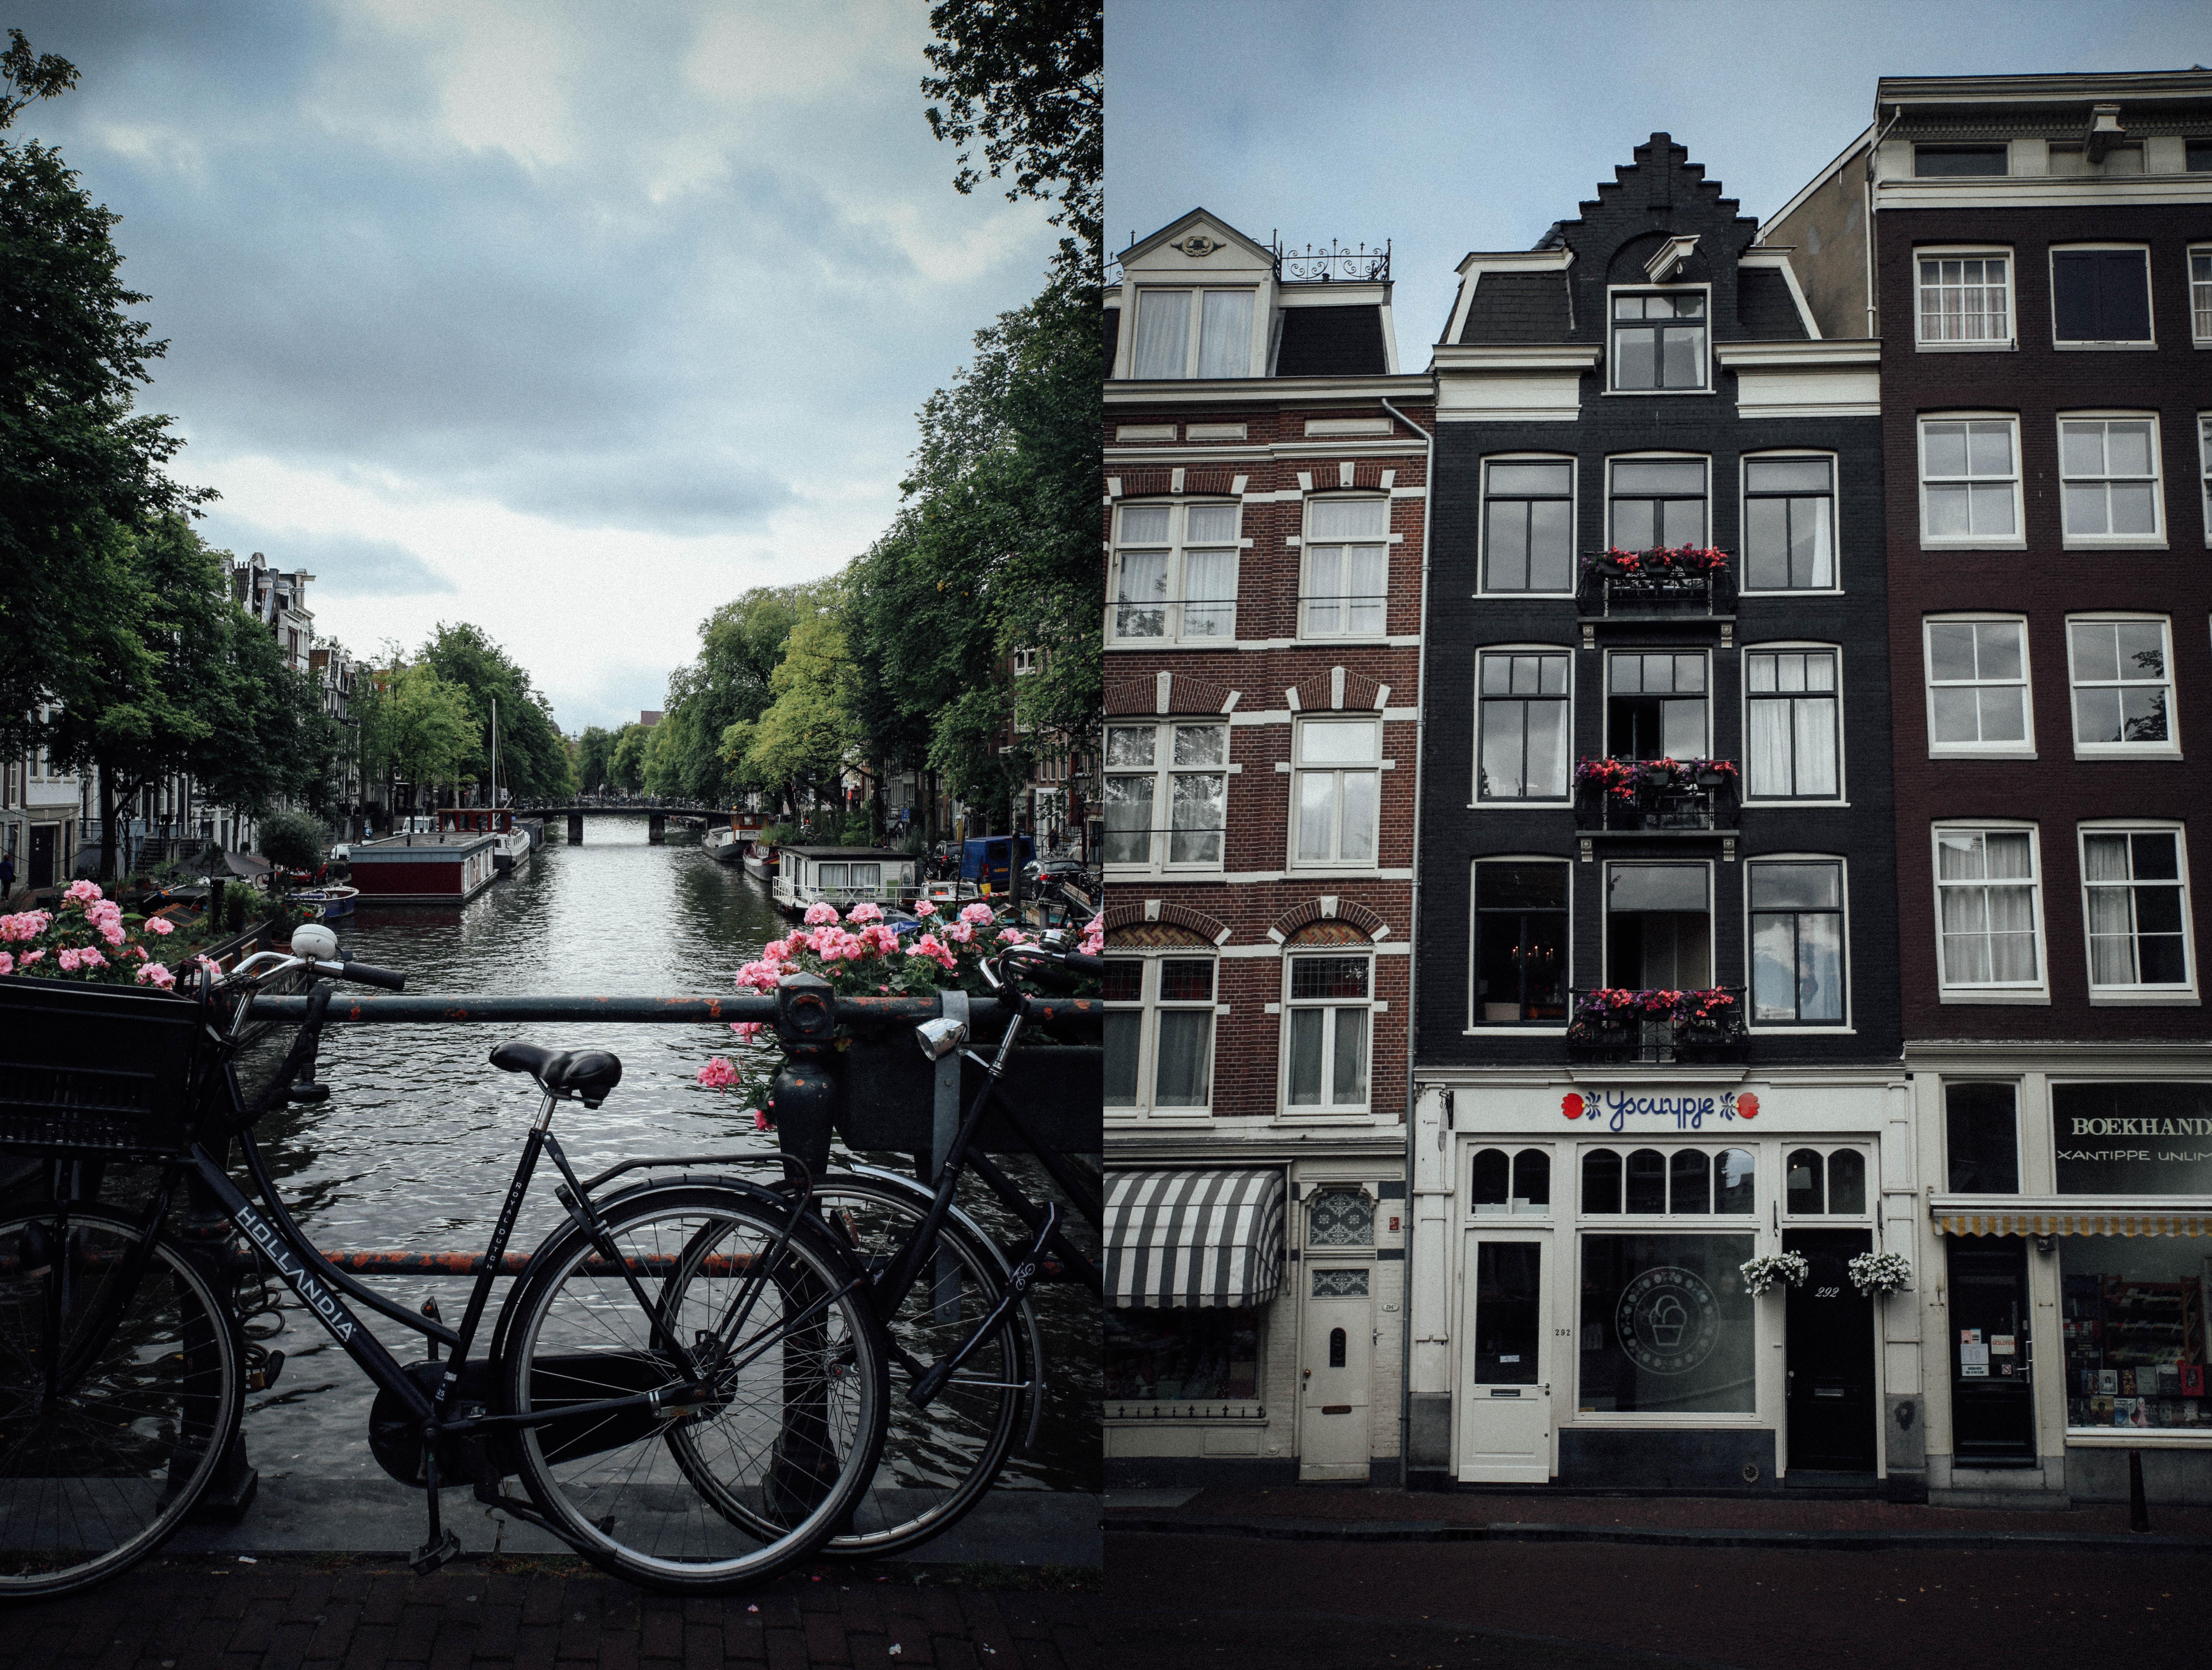 megandcook-voyage-amsterdam-82-bis-1-sur-1